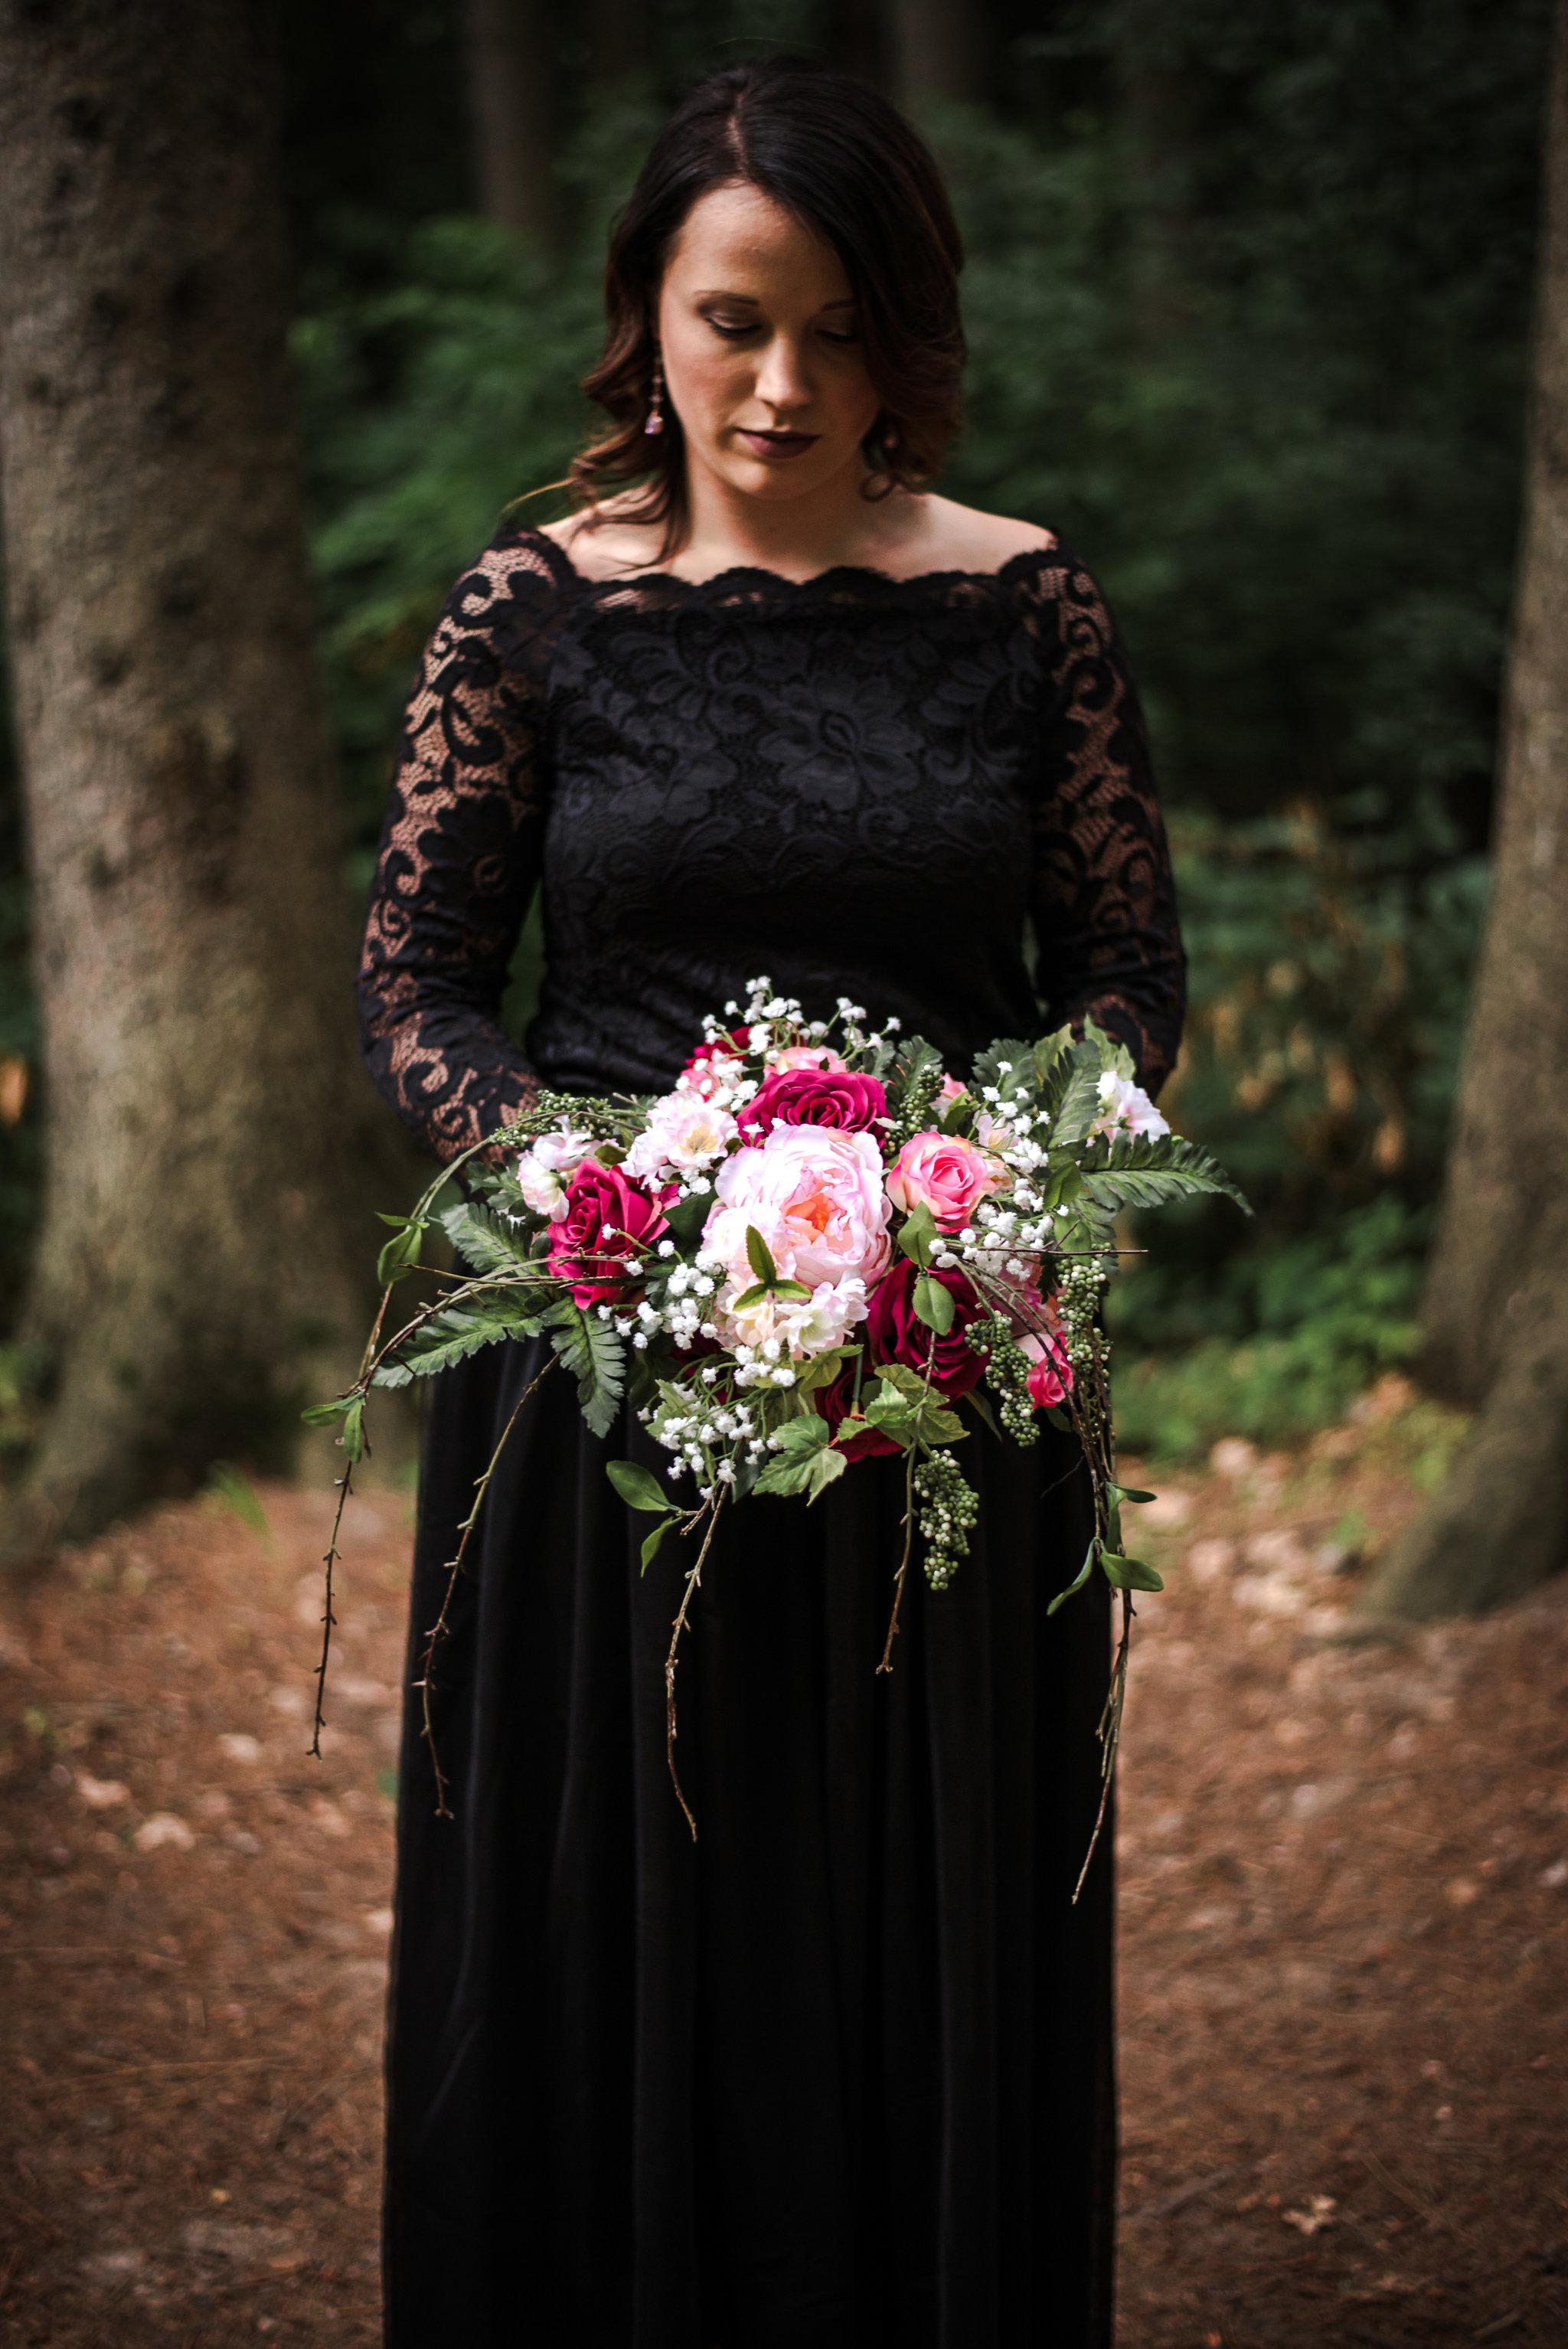 Moody Wedding - Black Lace Wedding Dress - Moody Pink + White Wedding Bouquet -- Wedding Blog - The Overwhelmed Bride